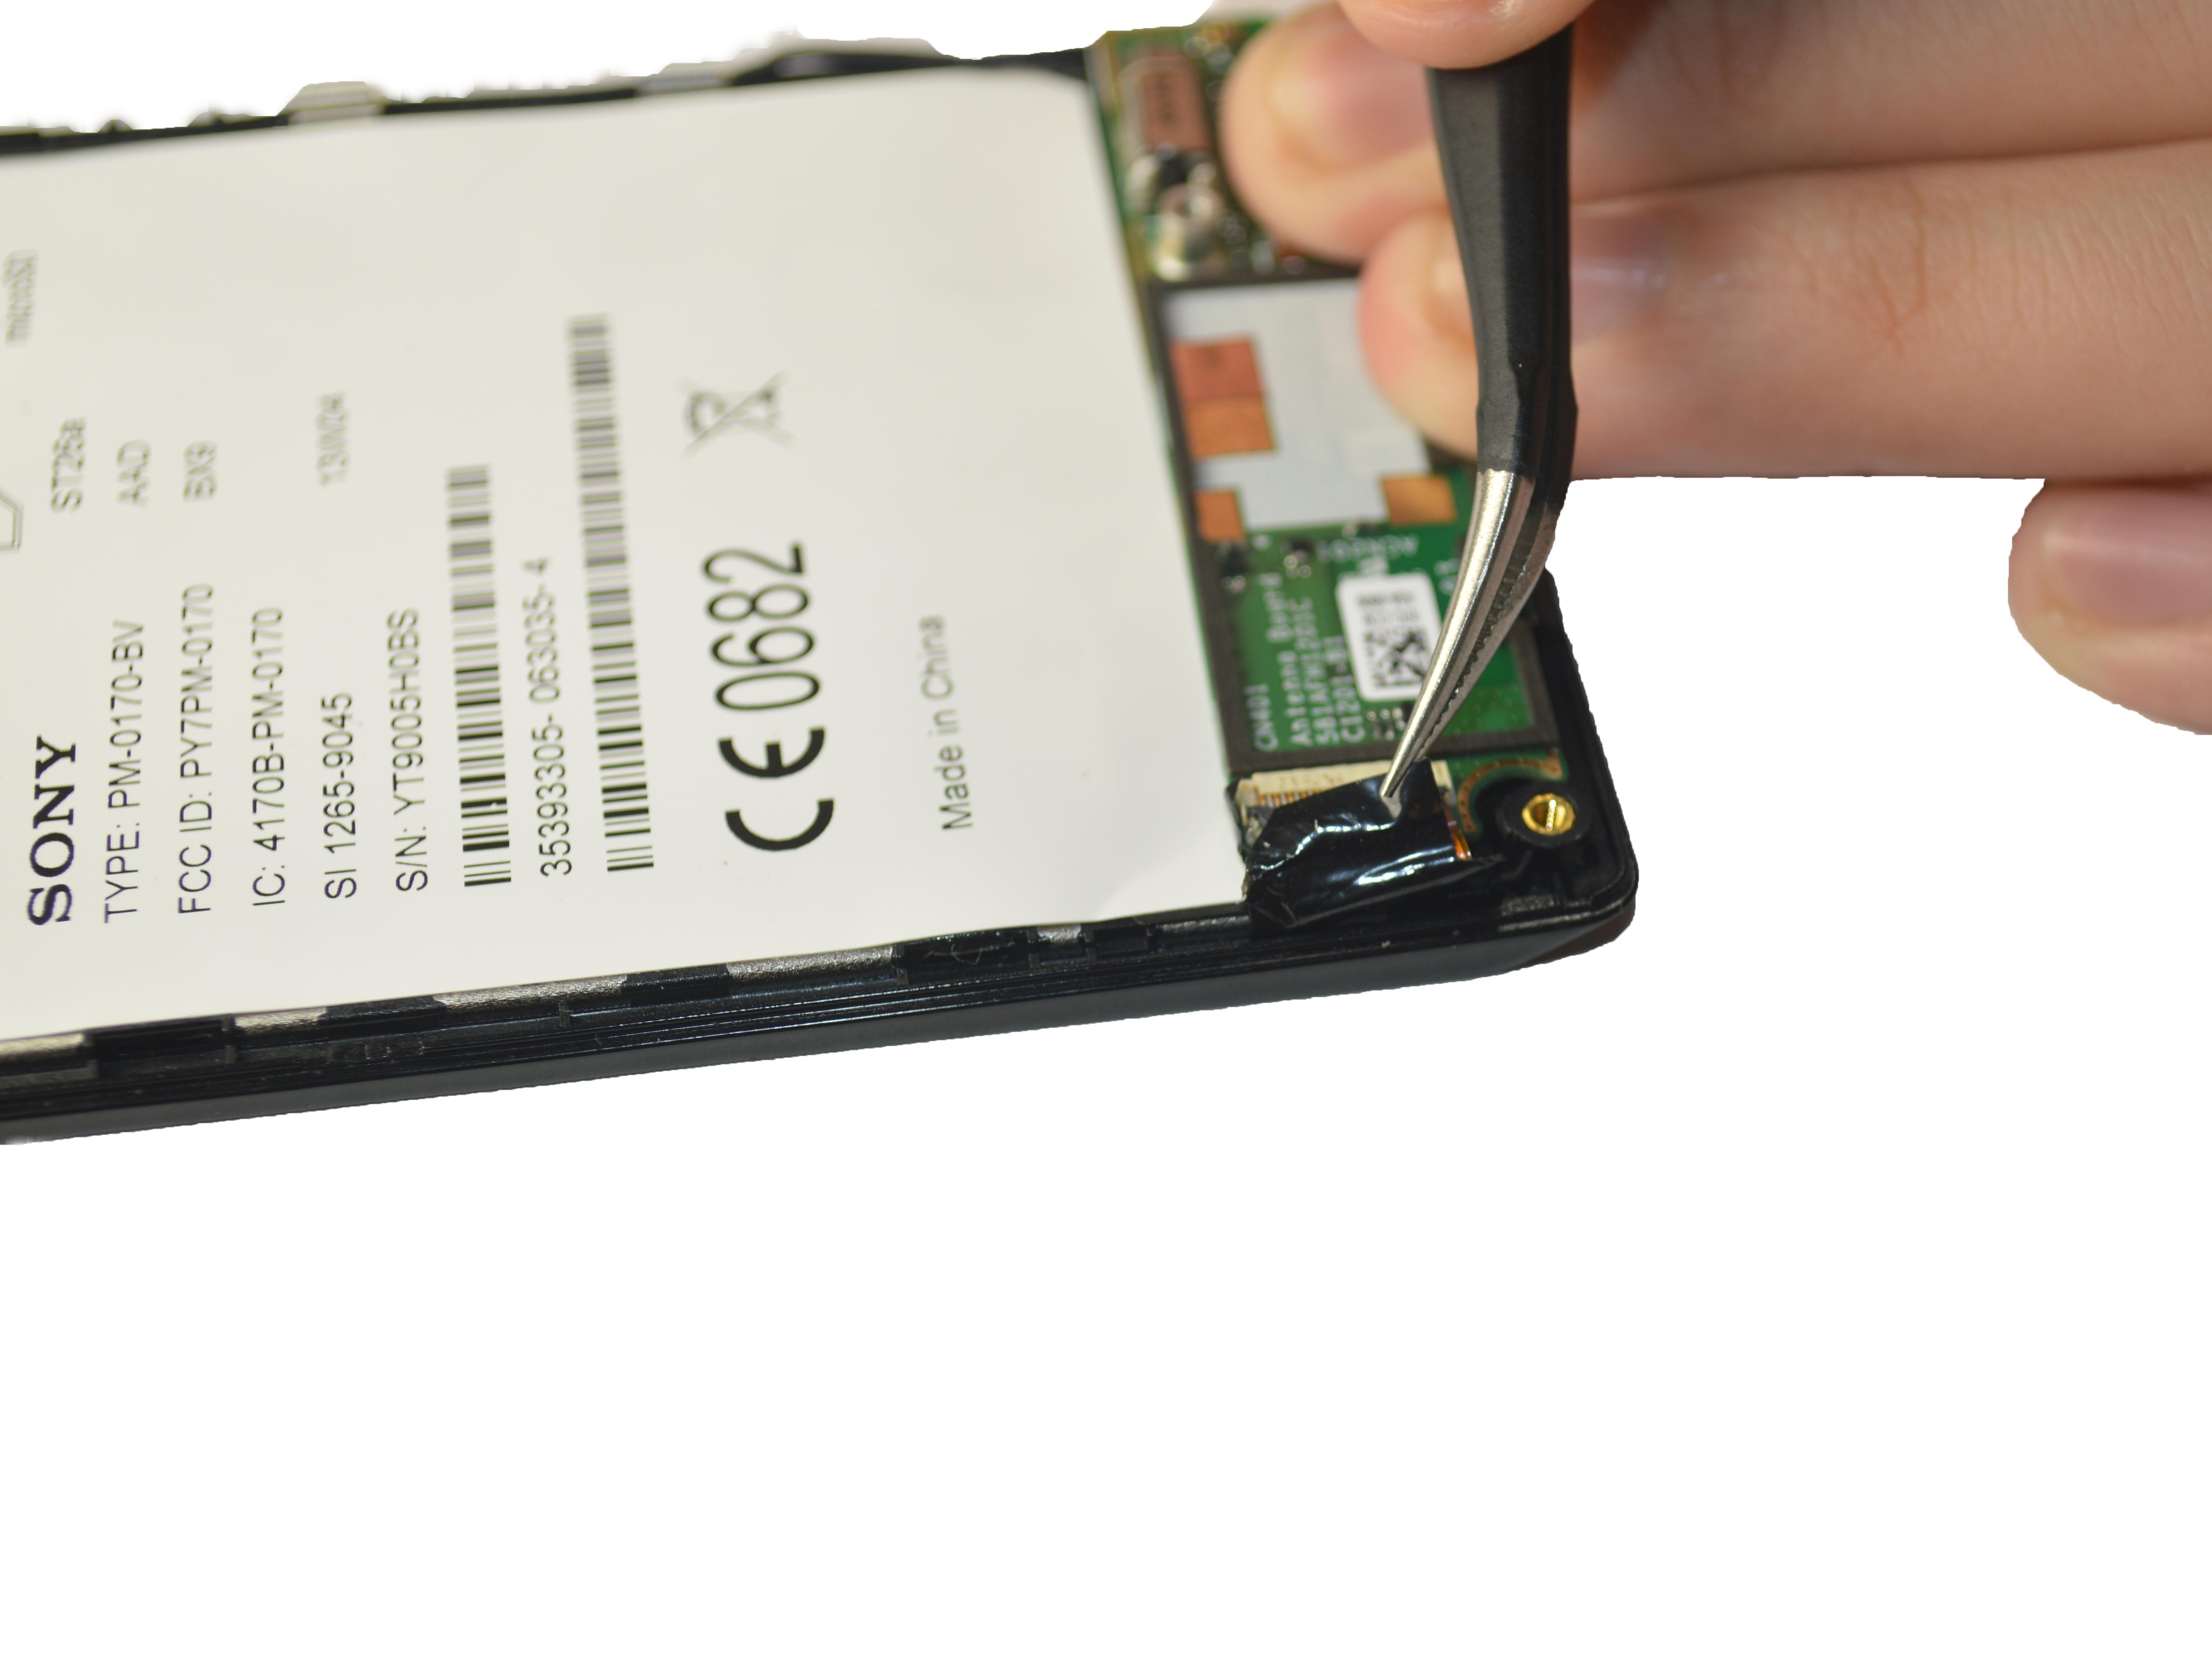 sony xperia j repair ifixit rh ifixit com Sony Xperia X Sony Xperia C2104